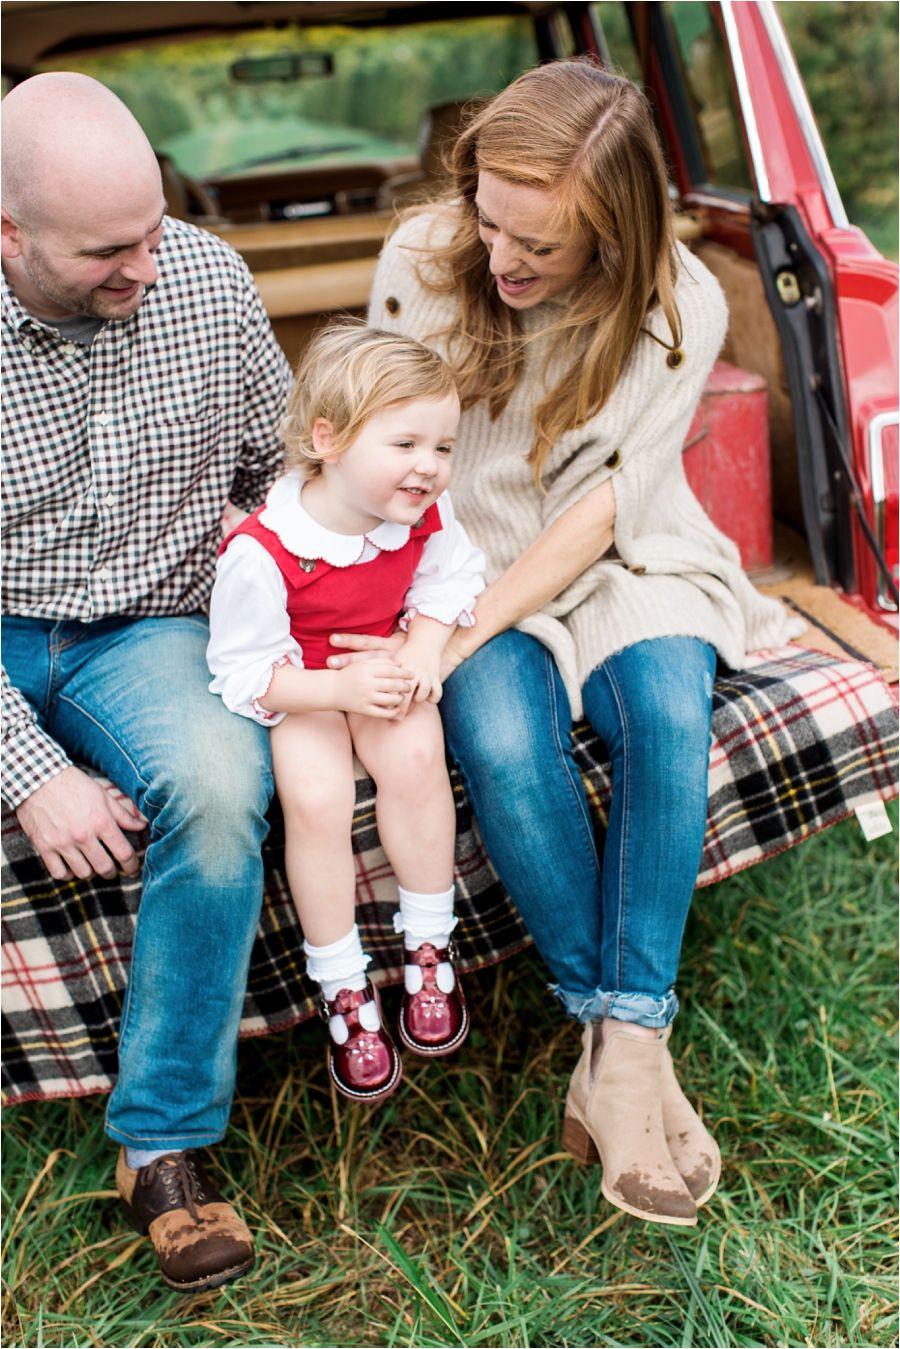 Christmas Tree Farm Lifestyle Family Photos The Jacobs Family By Charlottesville Family Photographer Farm Lifestyle Christmas Tree Farm Family Photos